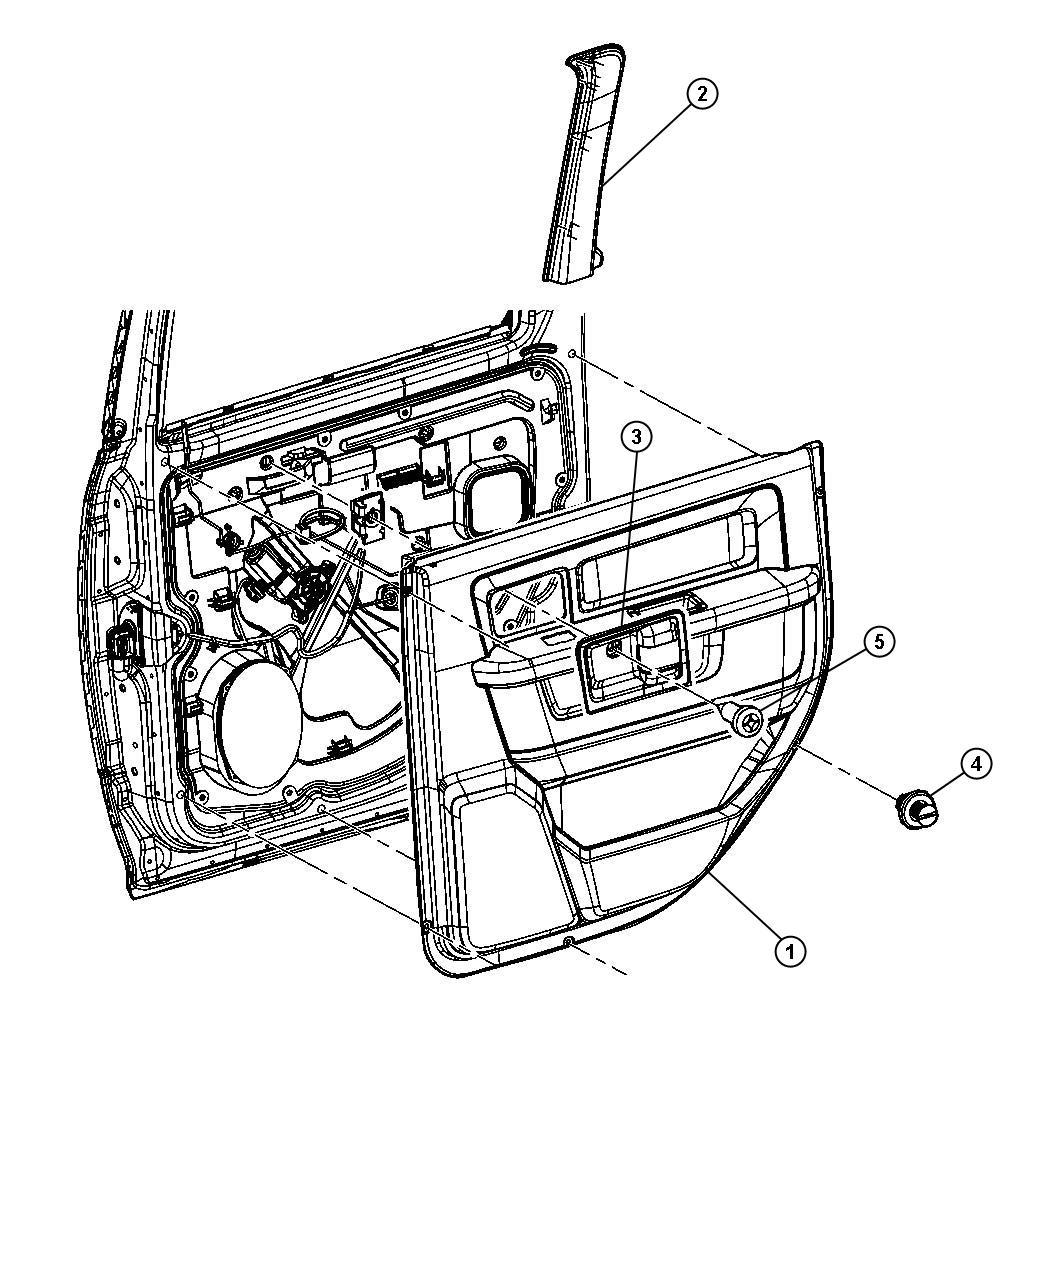 Dodge Ram 1500 Panel. Rear door trim. Right. [v3], with